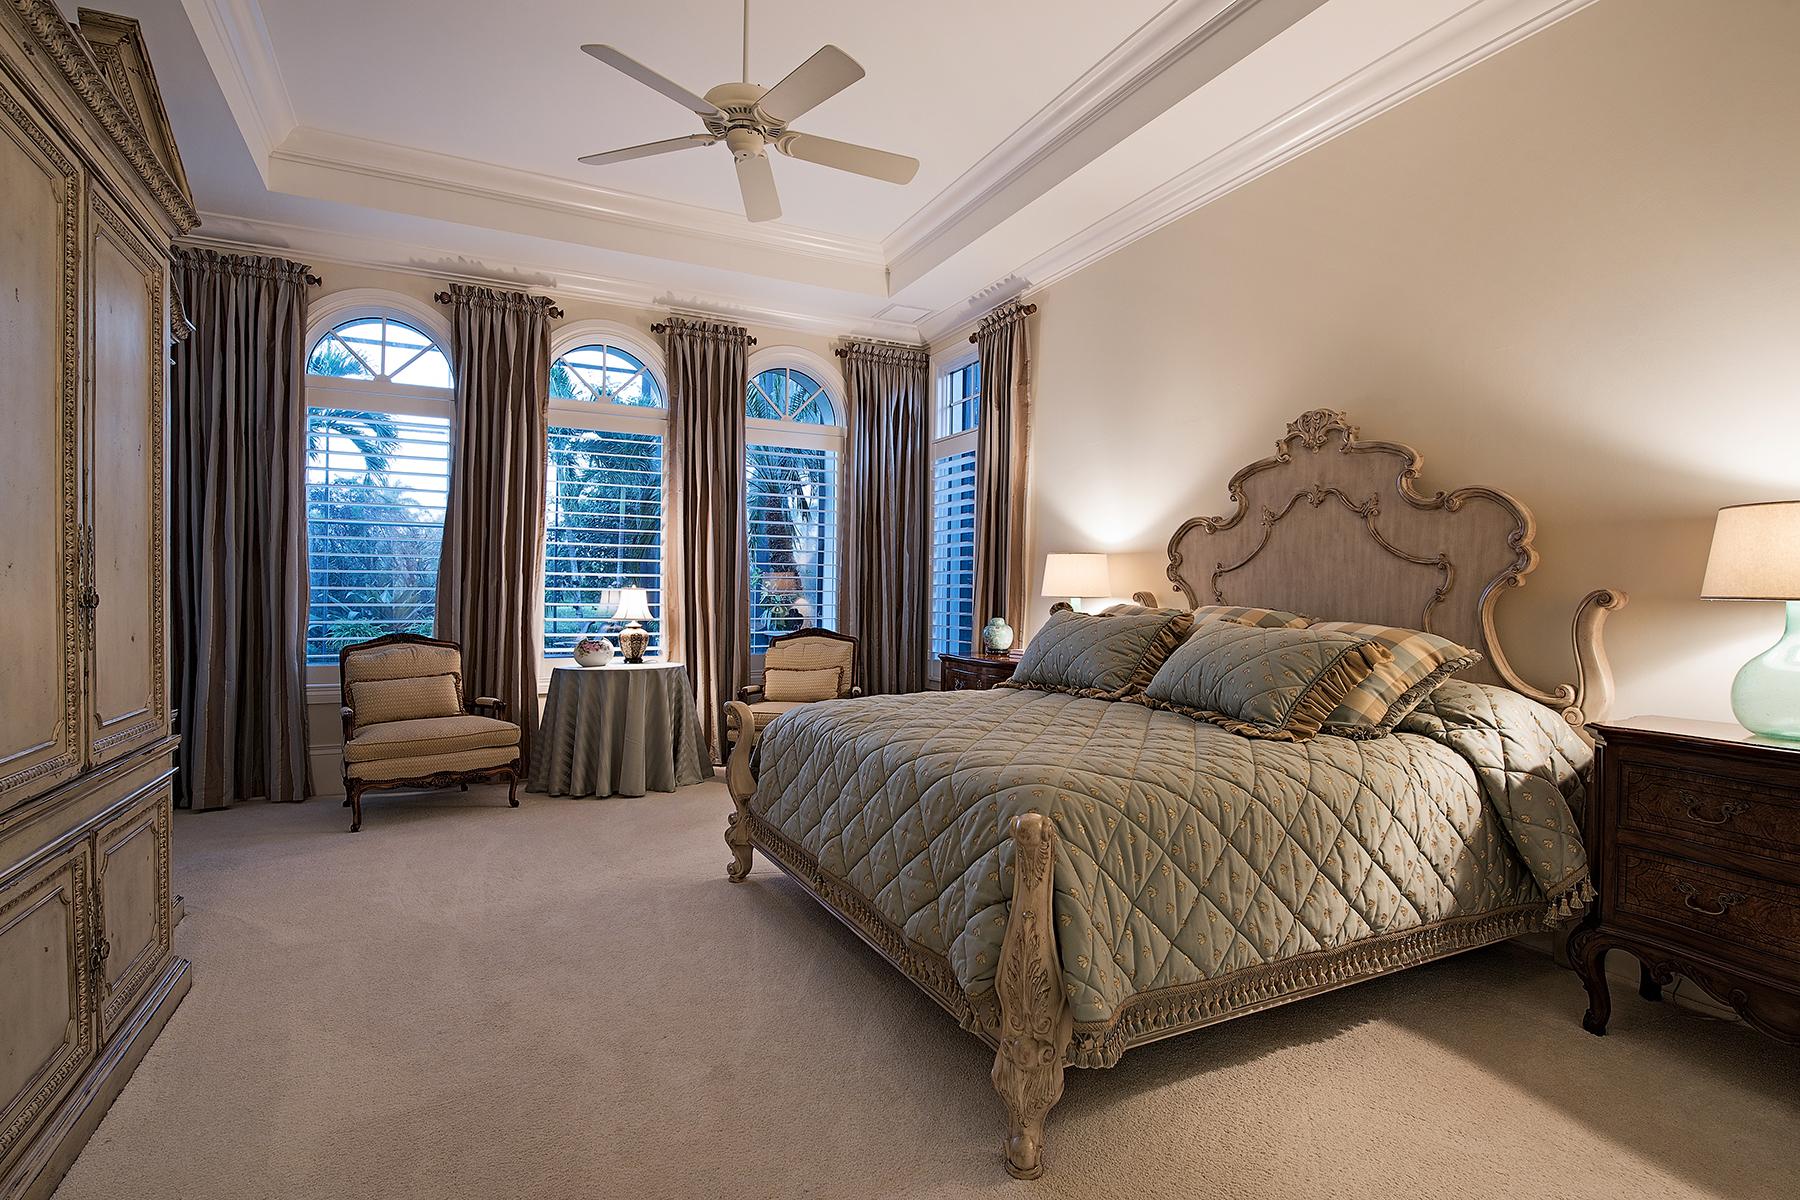 Additional photo for property listing at MEDITERRA - MEDICI 15208  Medici Way,  Naples, Florida 34110 United States